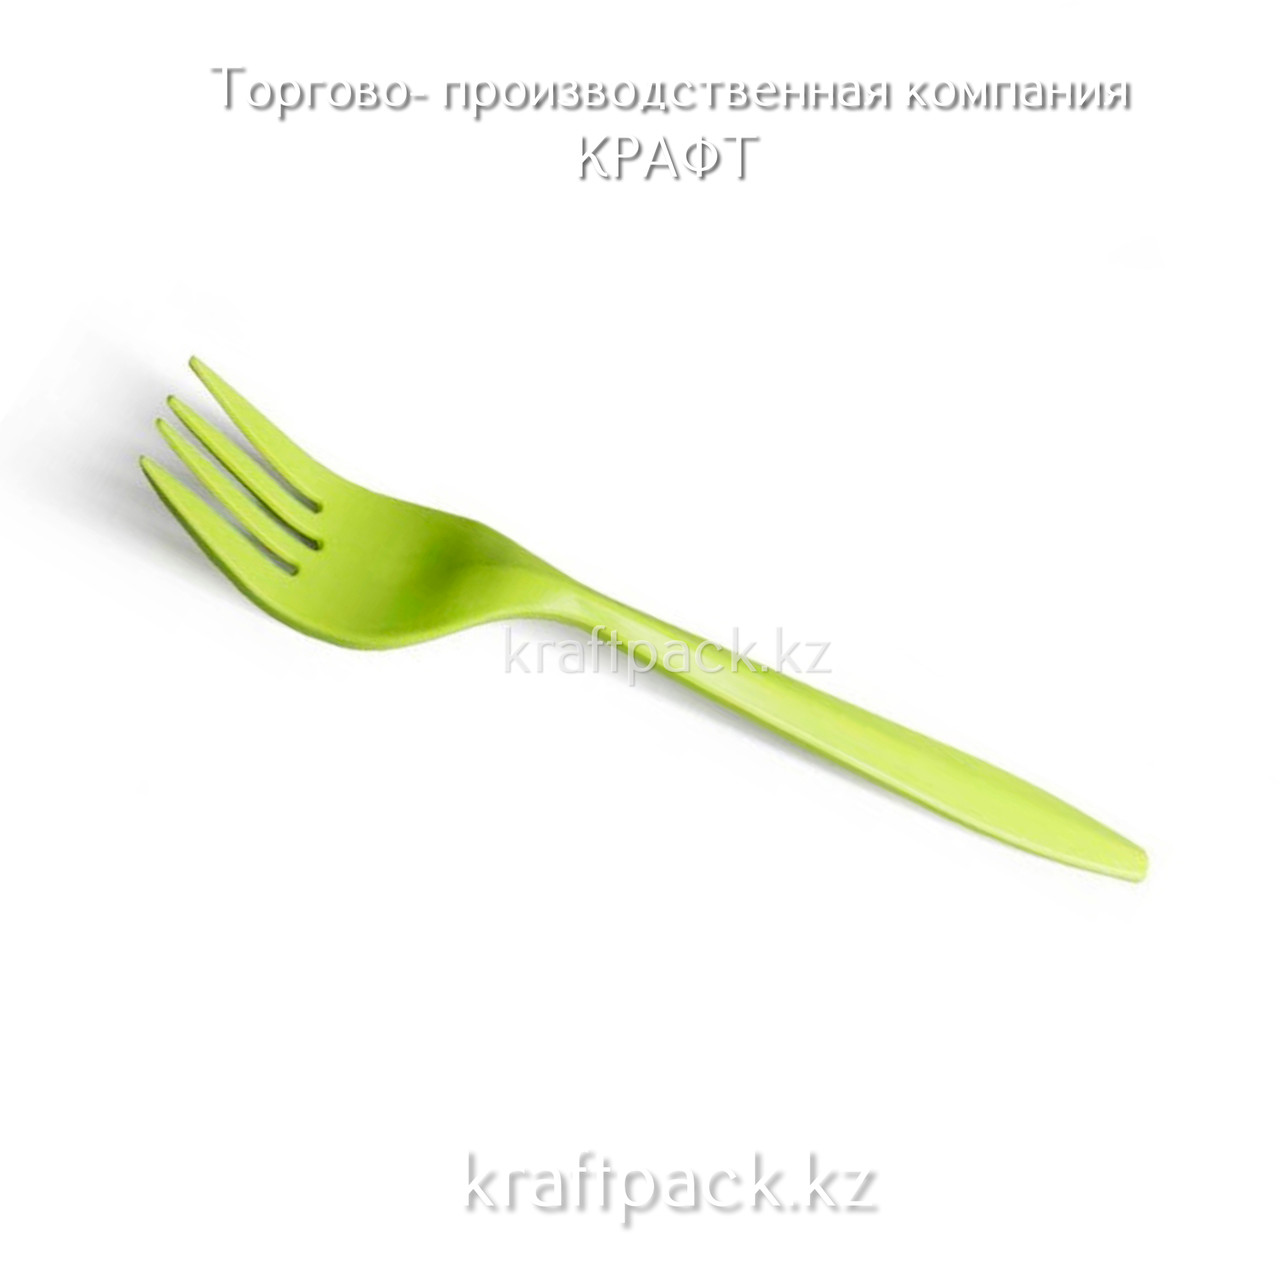 Вилка зеленая 150мм, из кукурузного крахмала (50/1000)